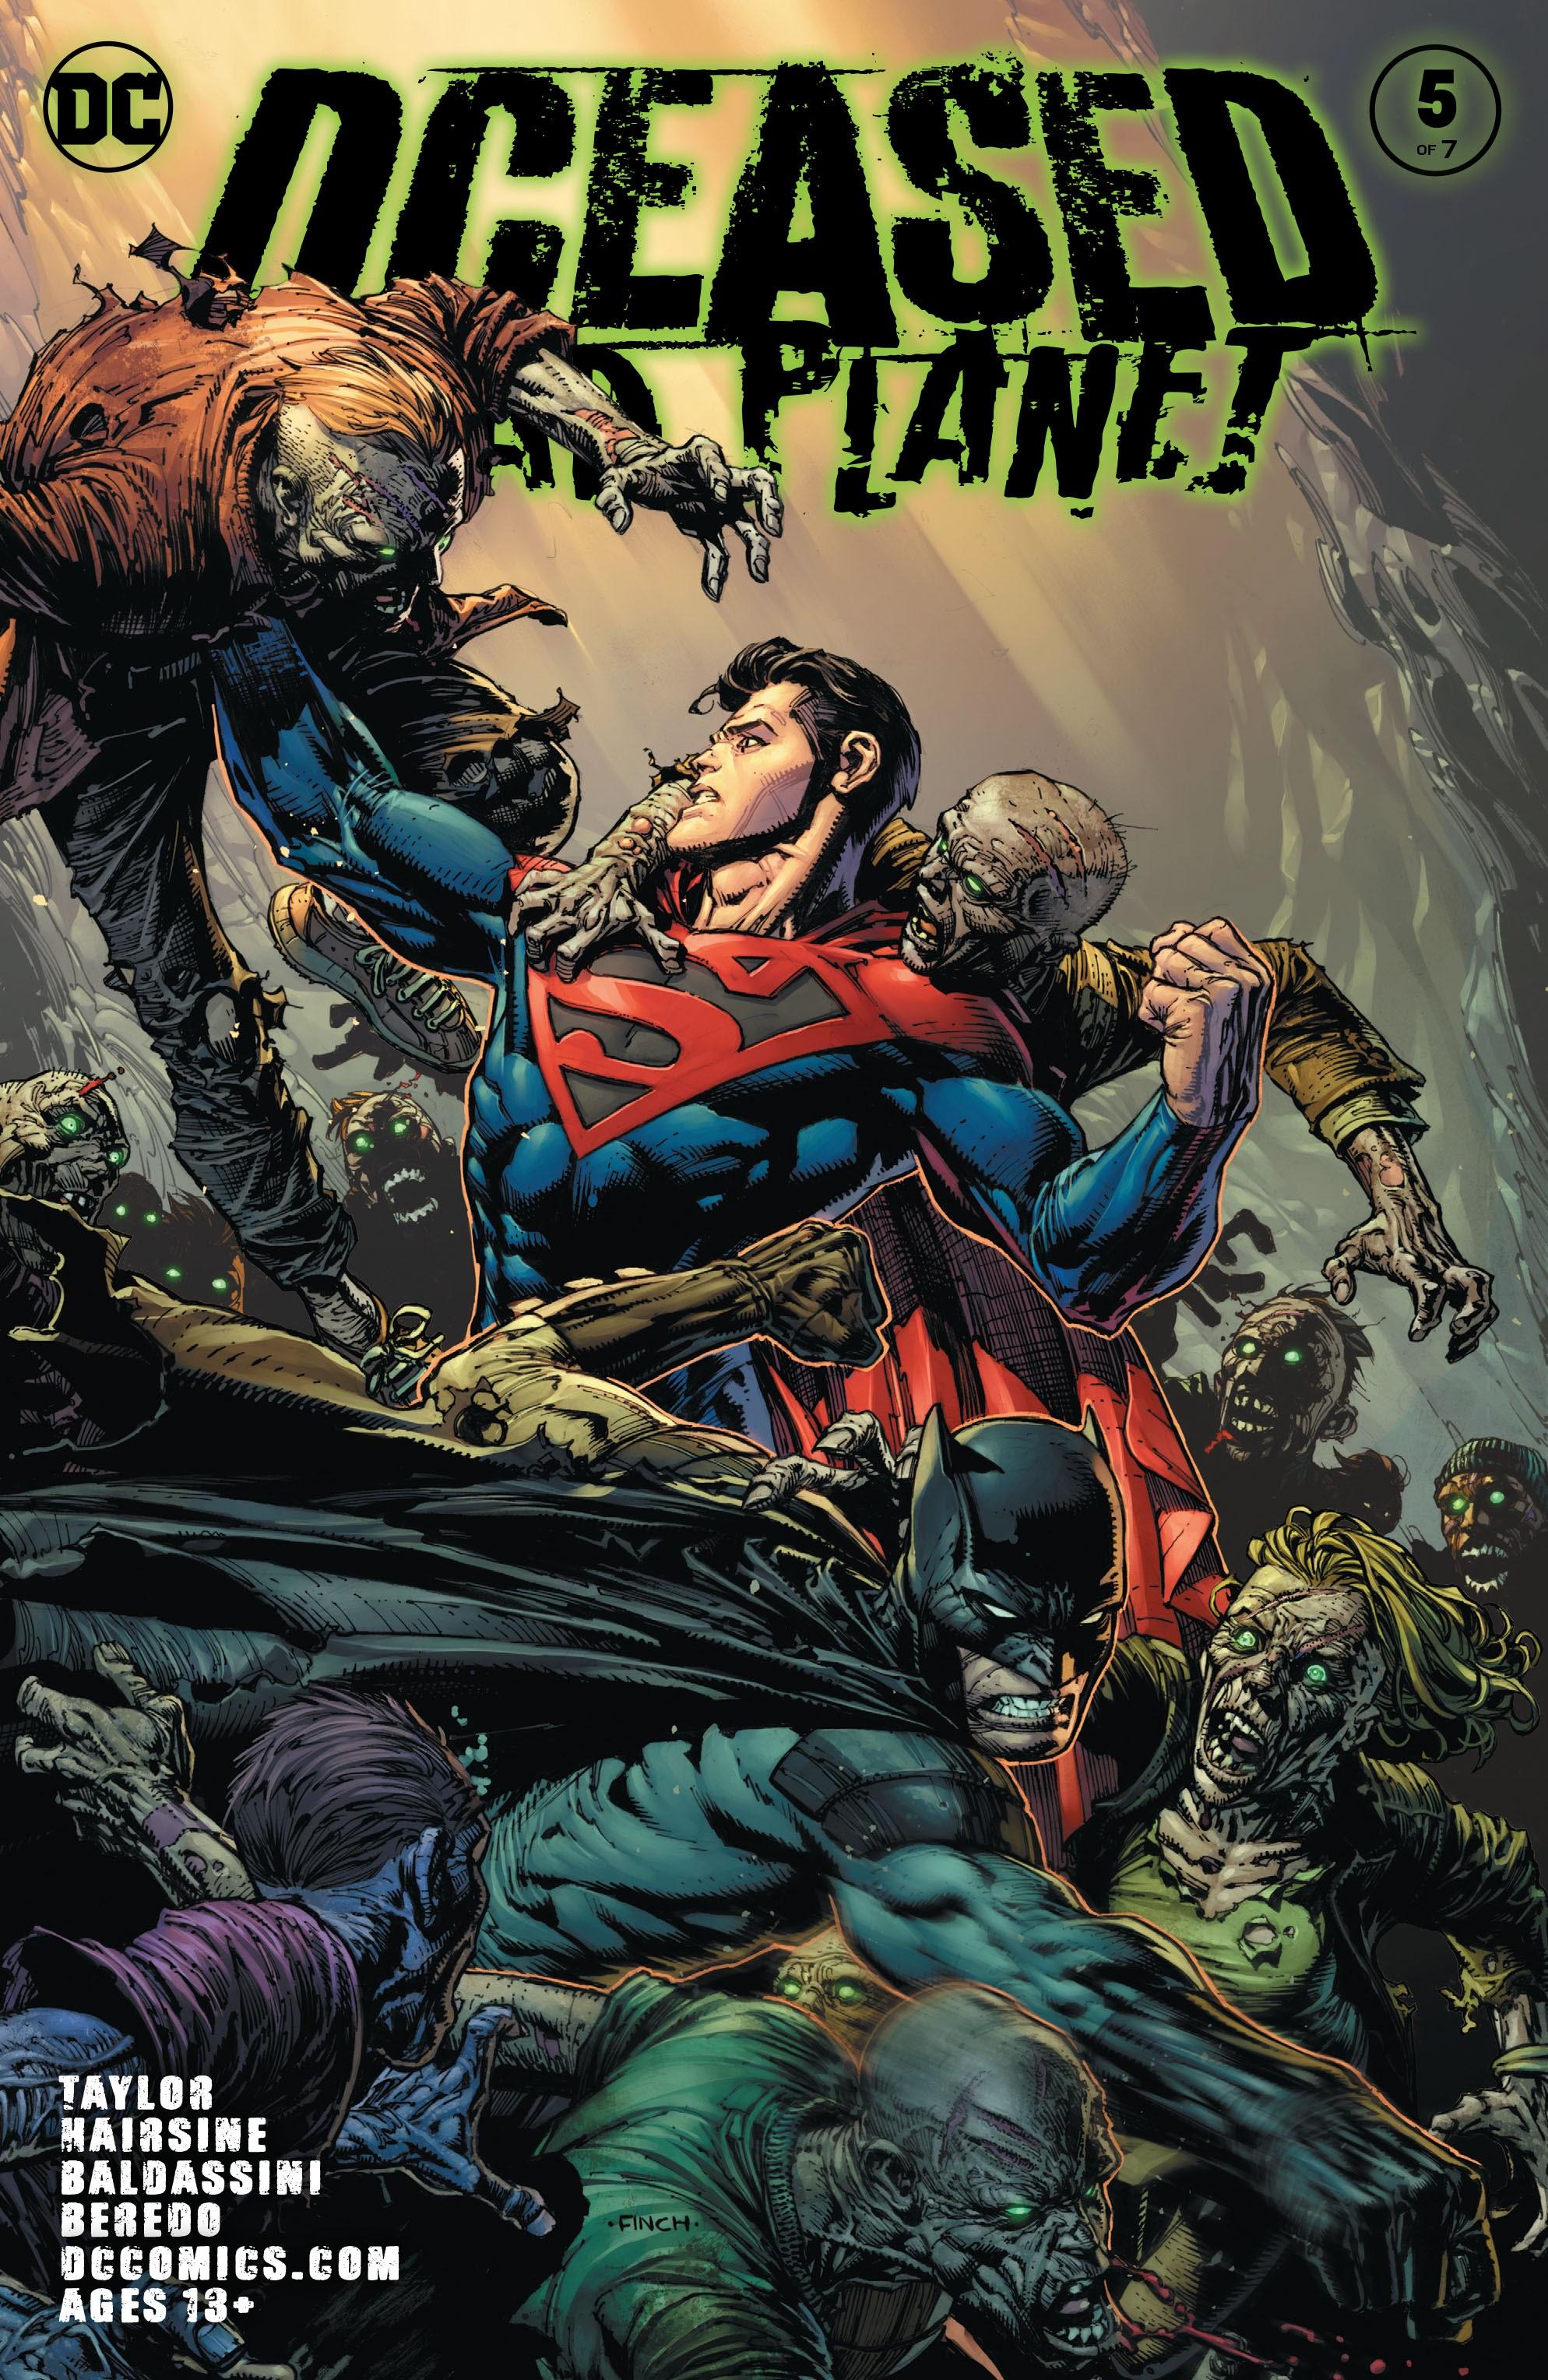 DCeased: Dead Planet Vol 1 5